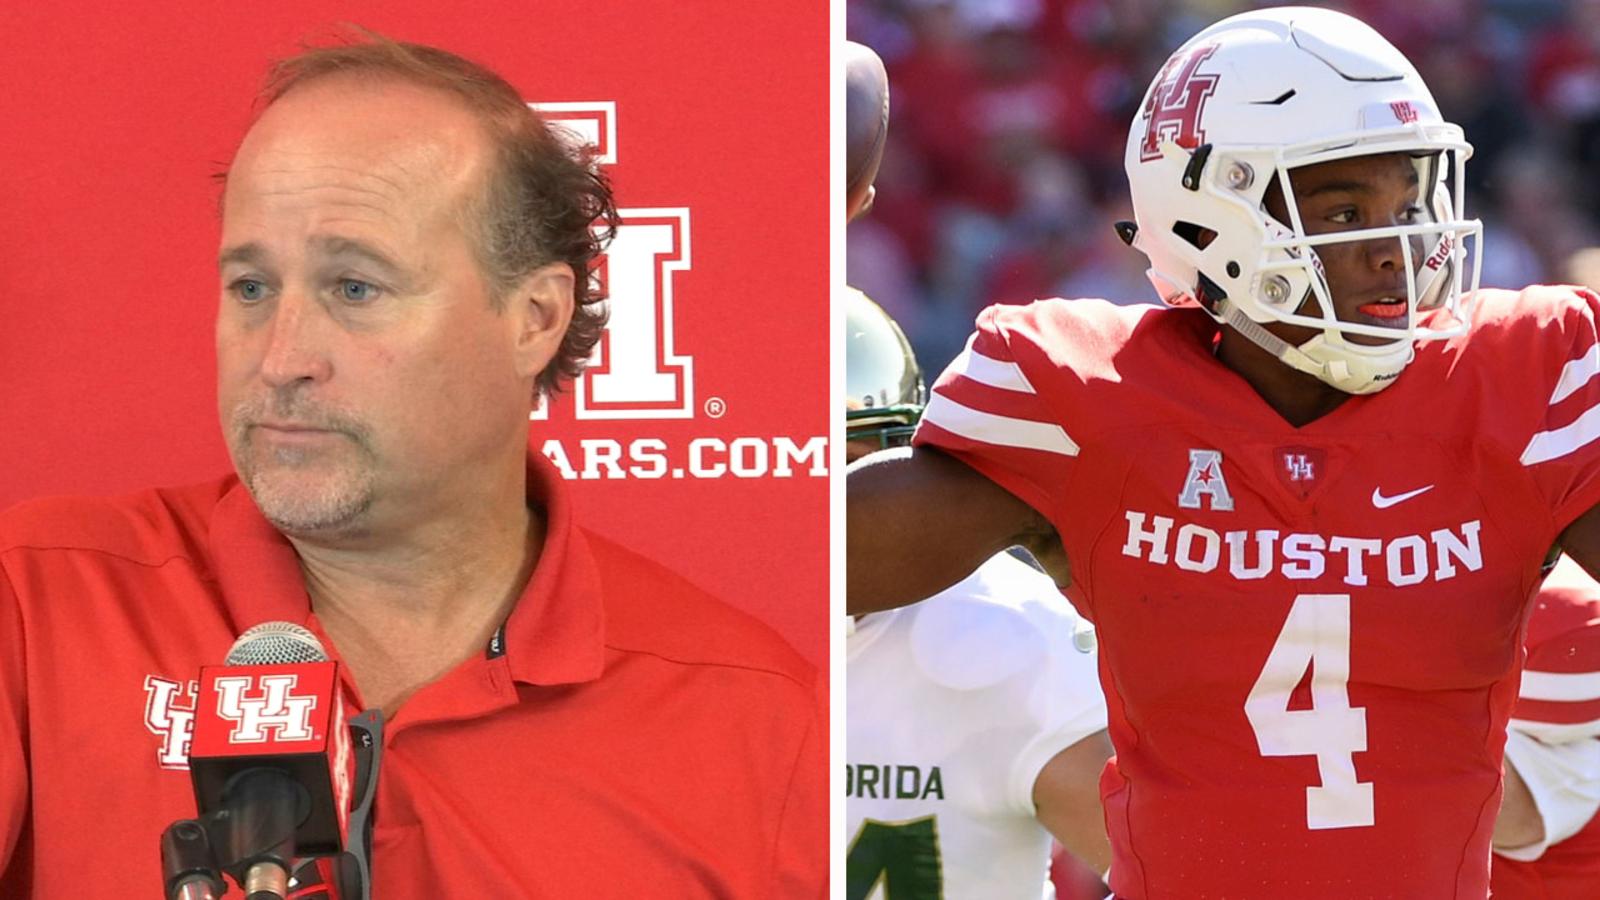 University of Houston falls to Oklahoma Sooners 49 - 31 in season debut - KTRK-TV